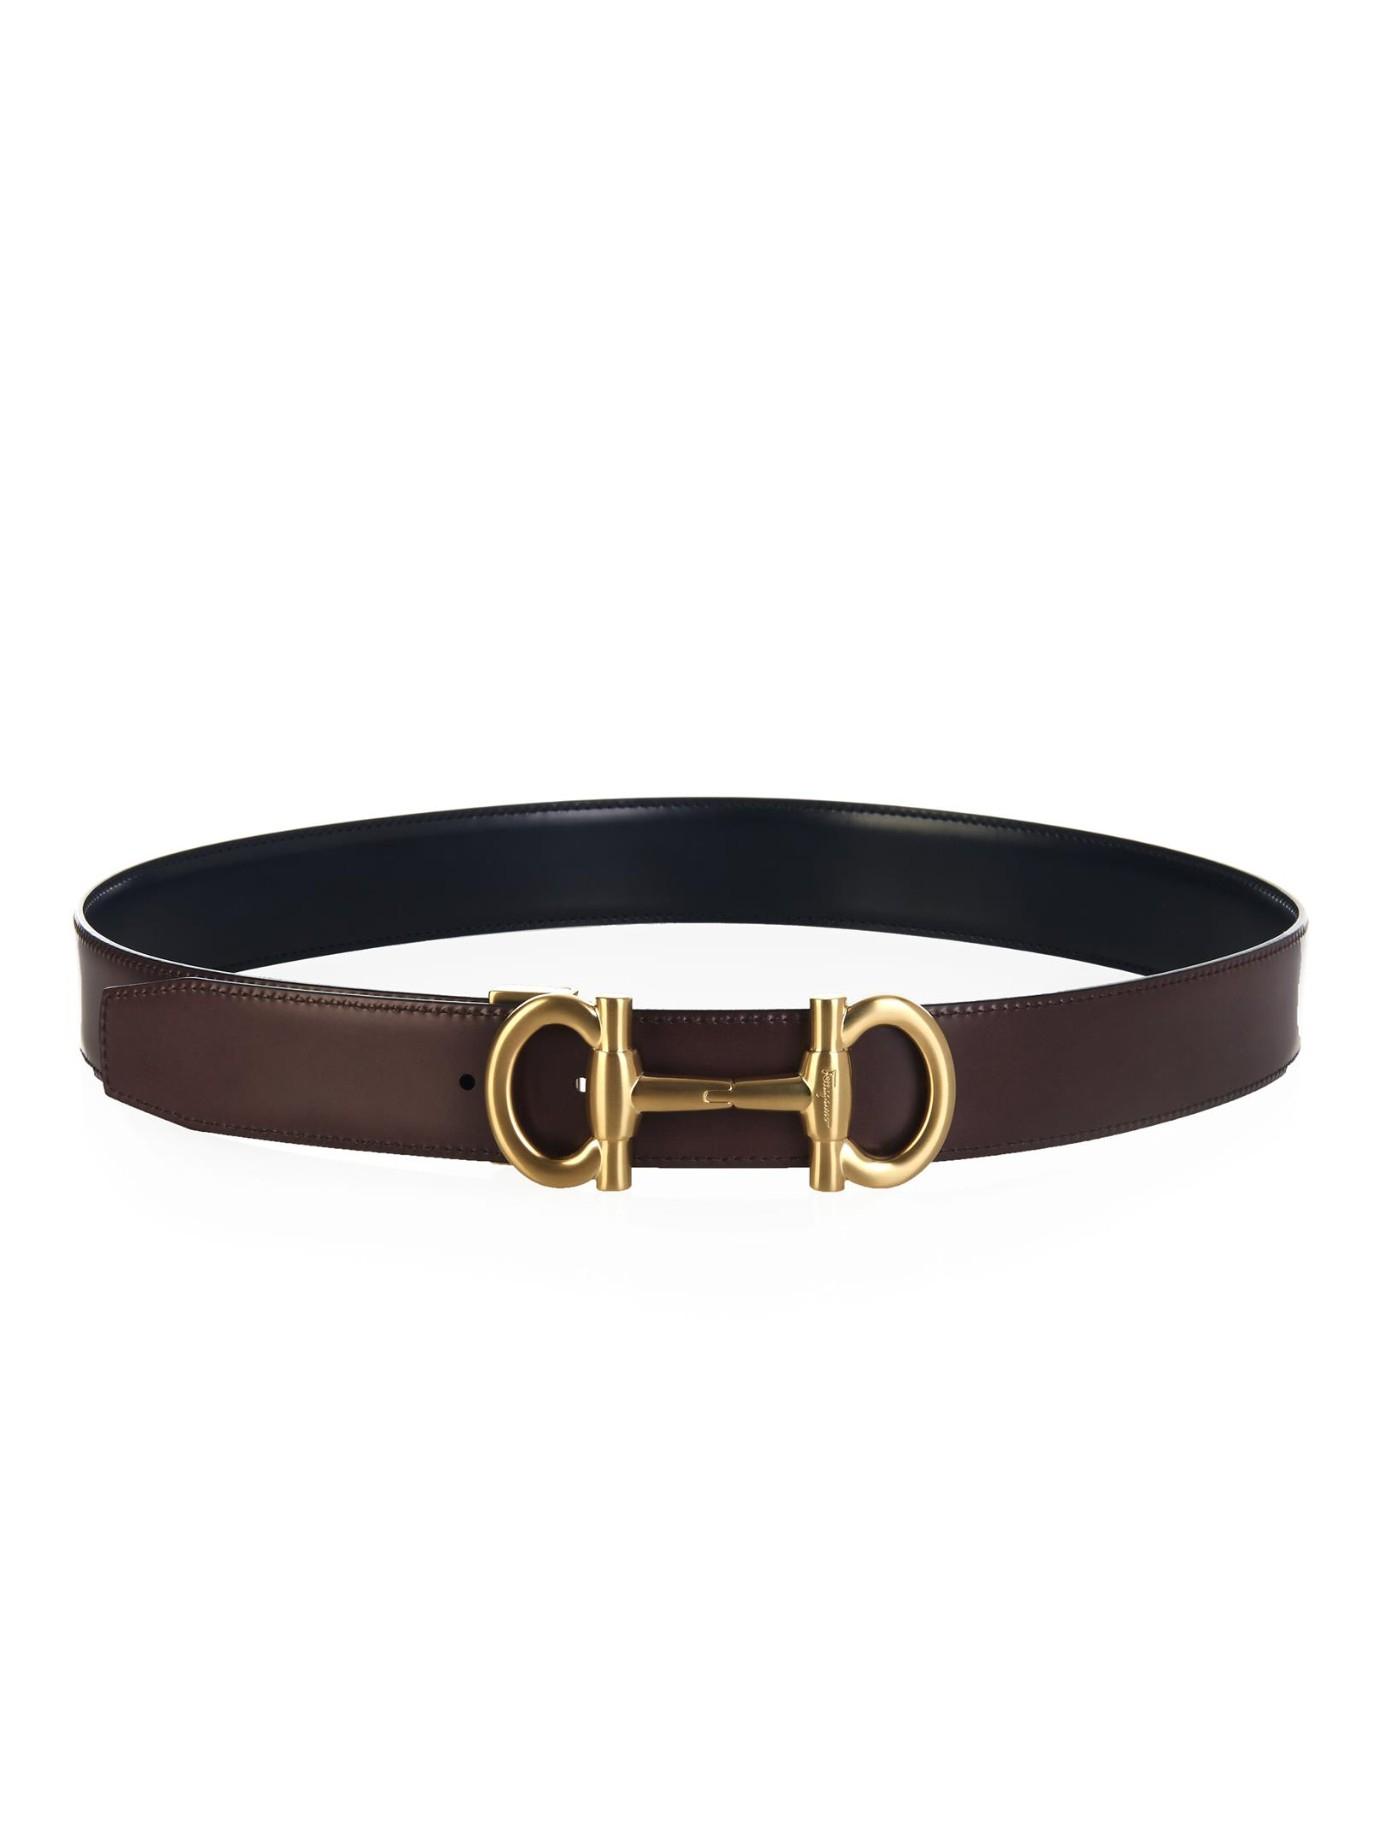 Ferragamo Parigi Reversible Leather Belt In Black For Men